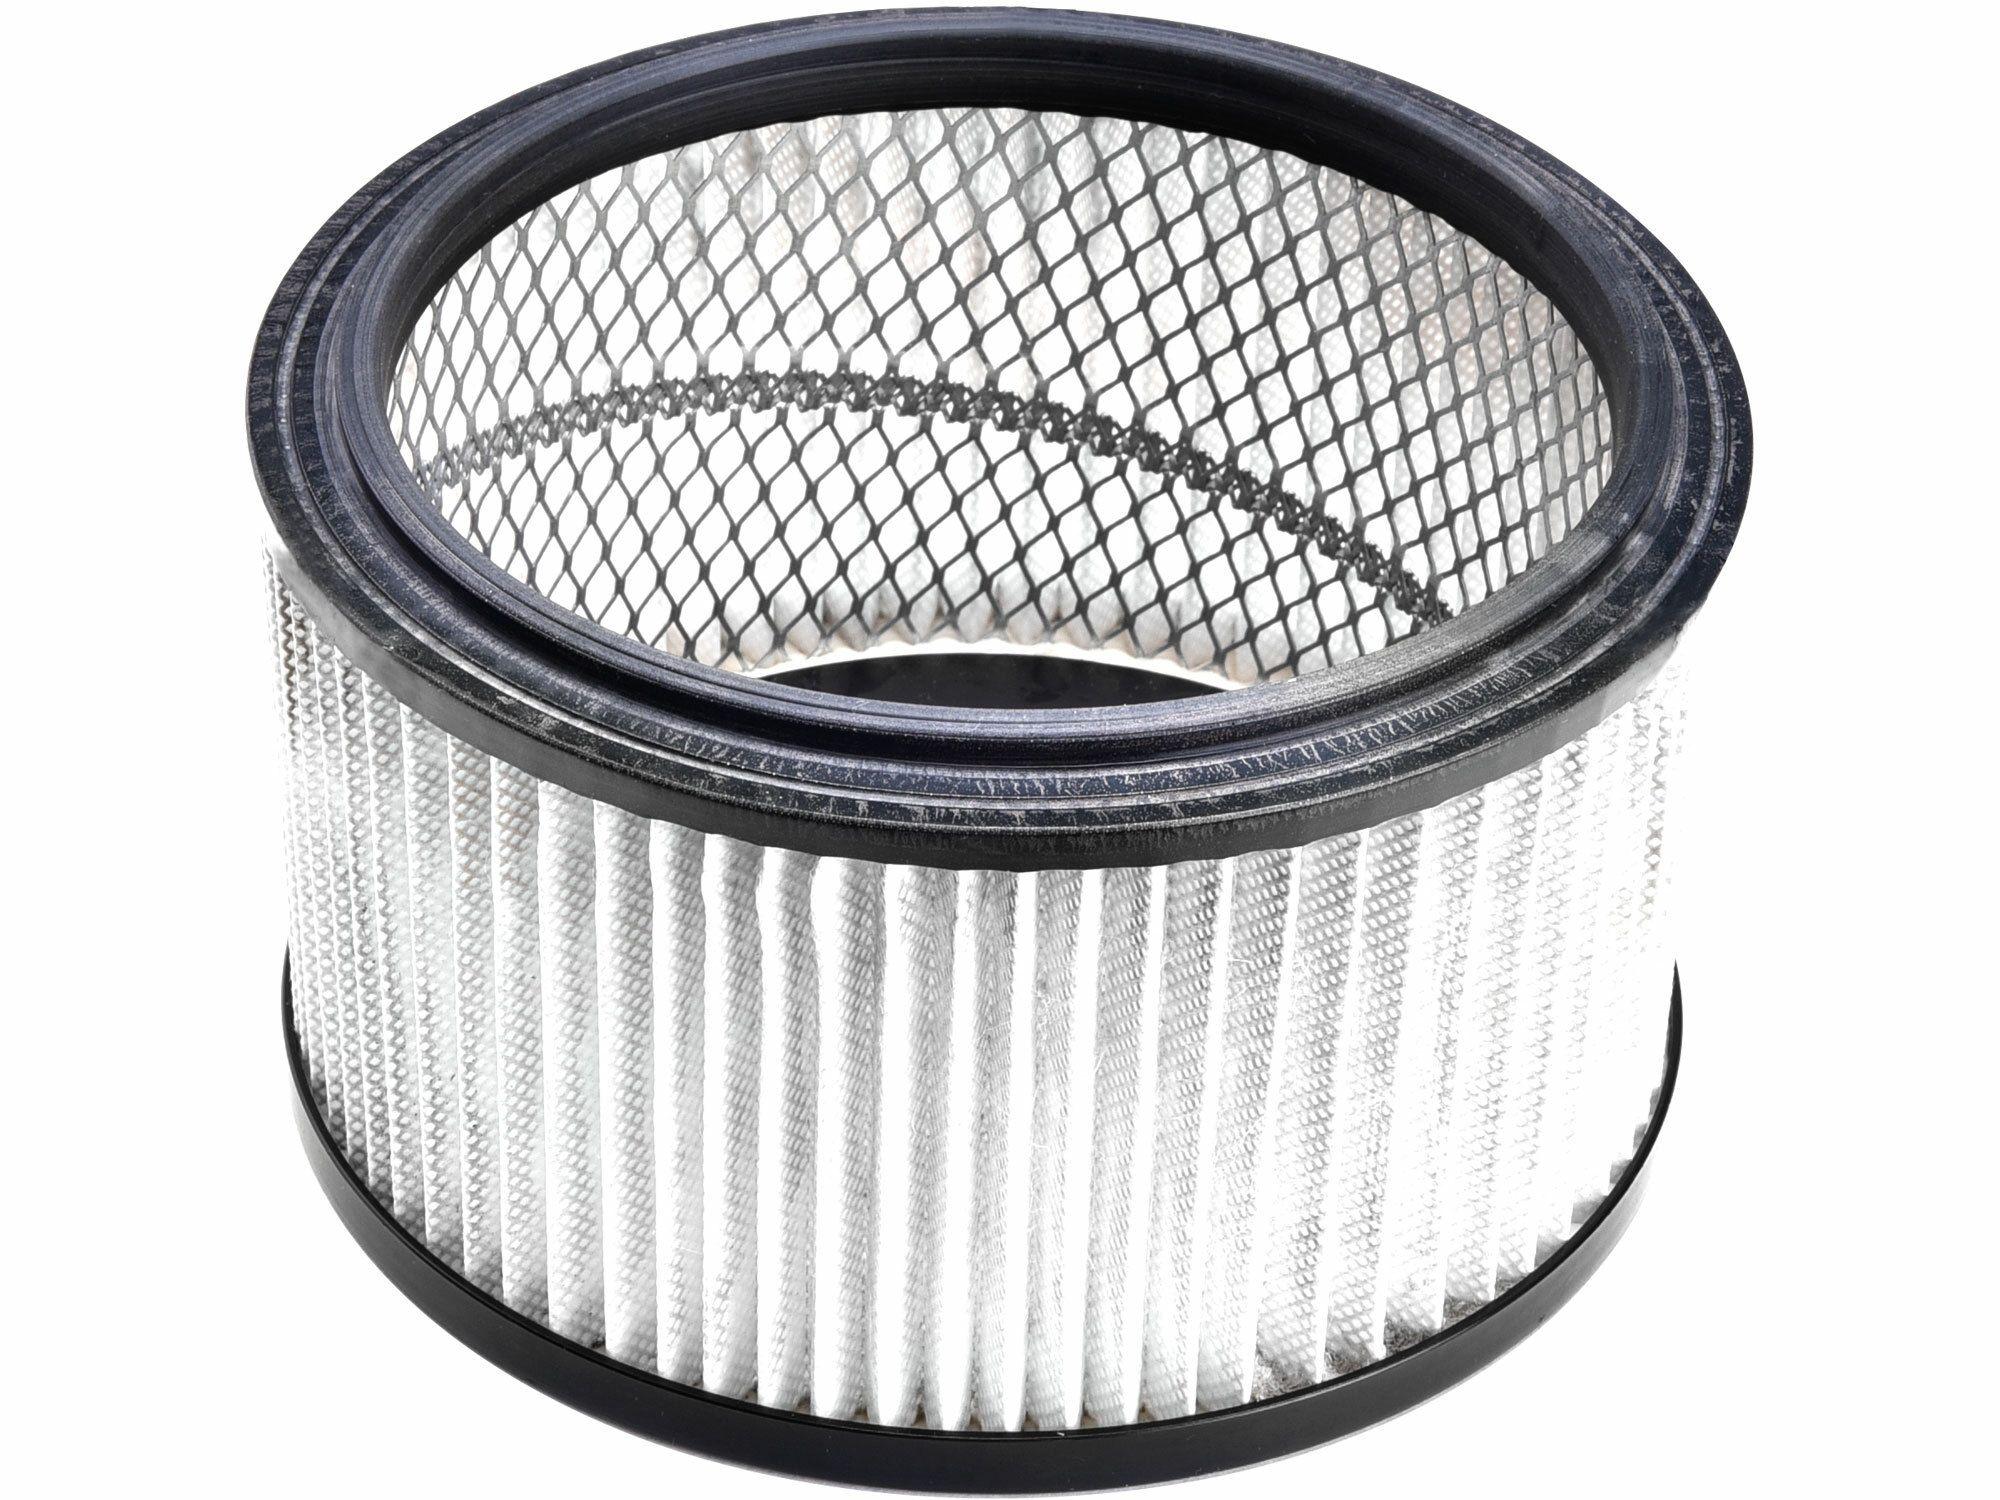 Filtr HEPA, pro 8895800 EXTOL-PREMIUM